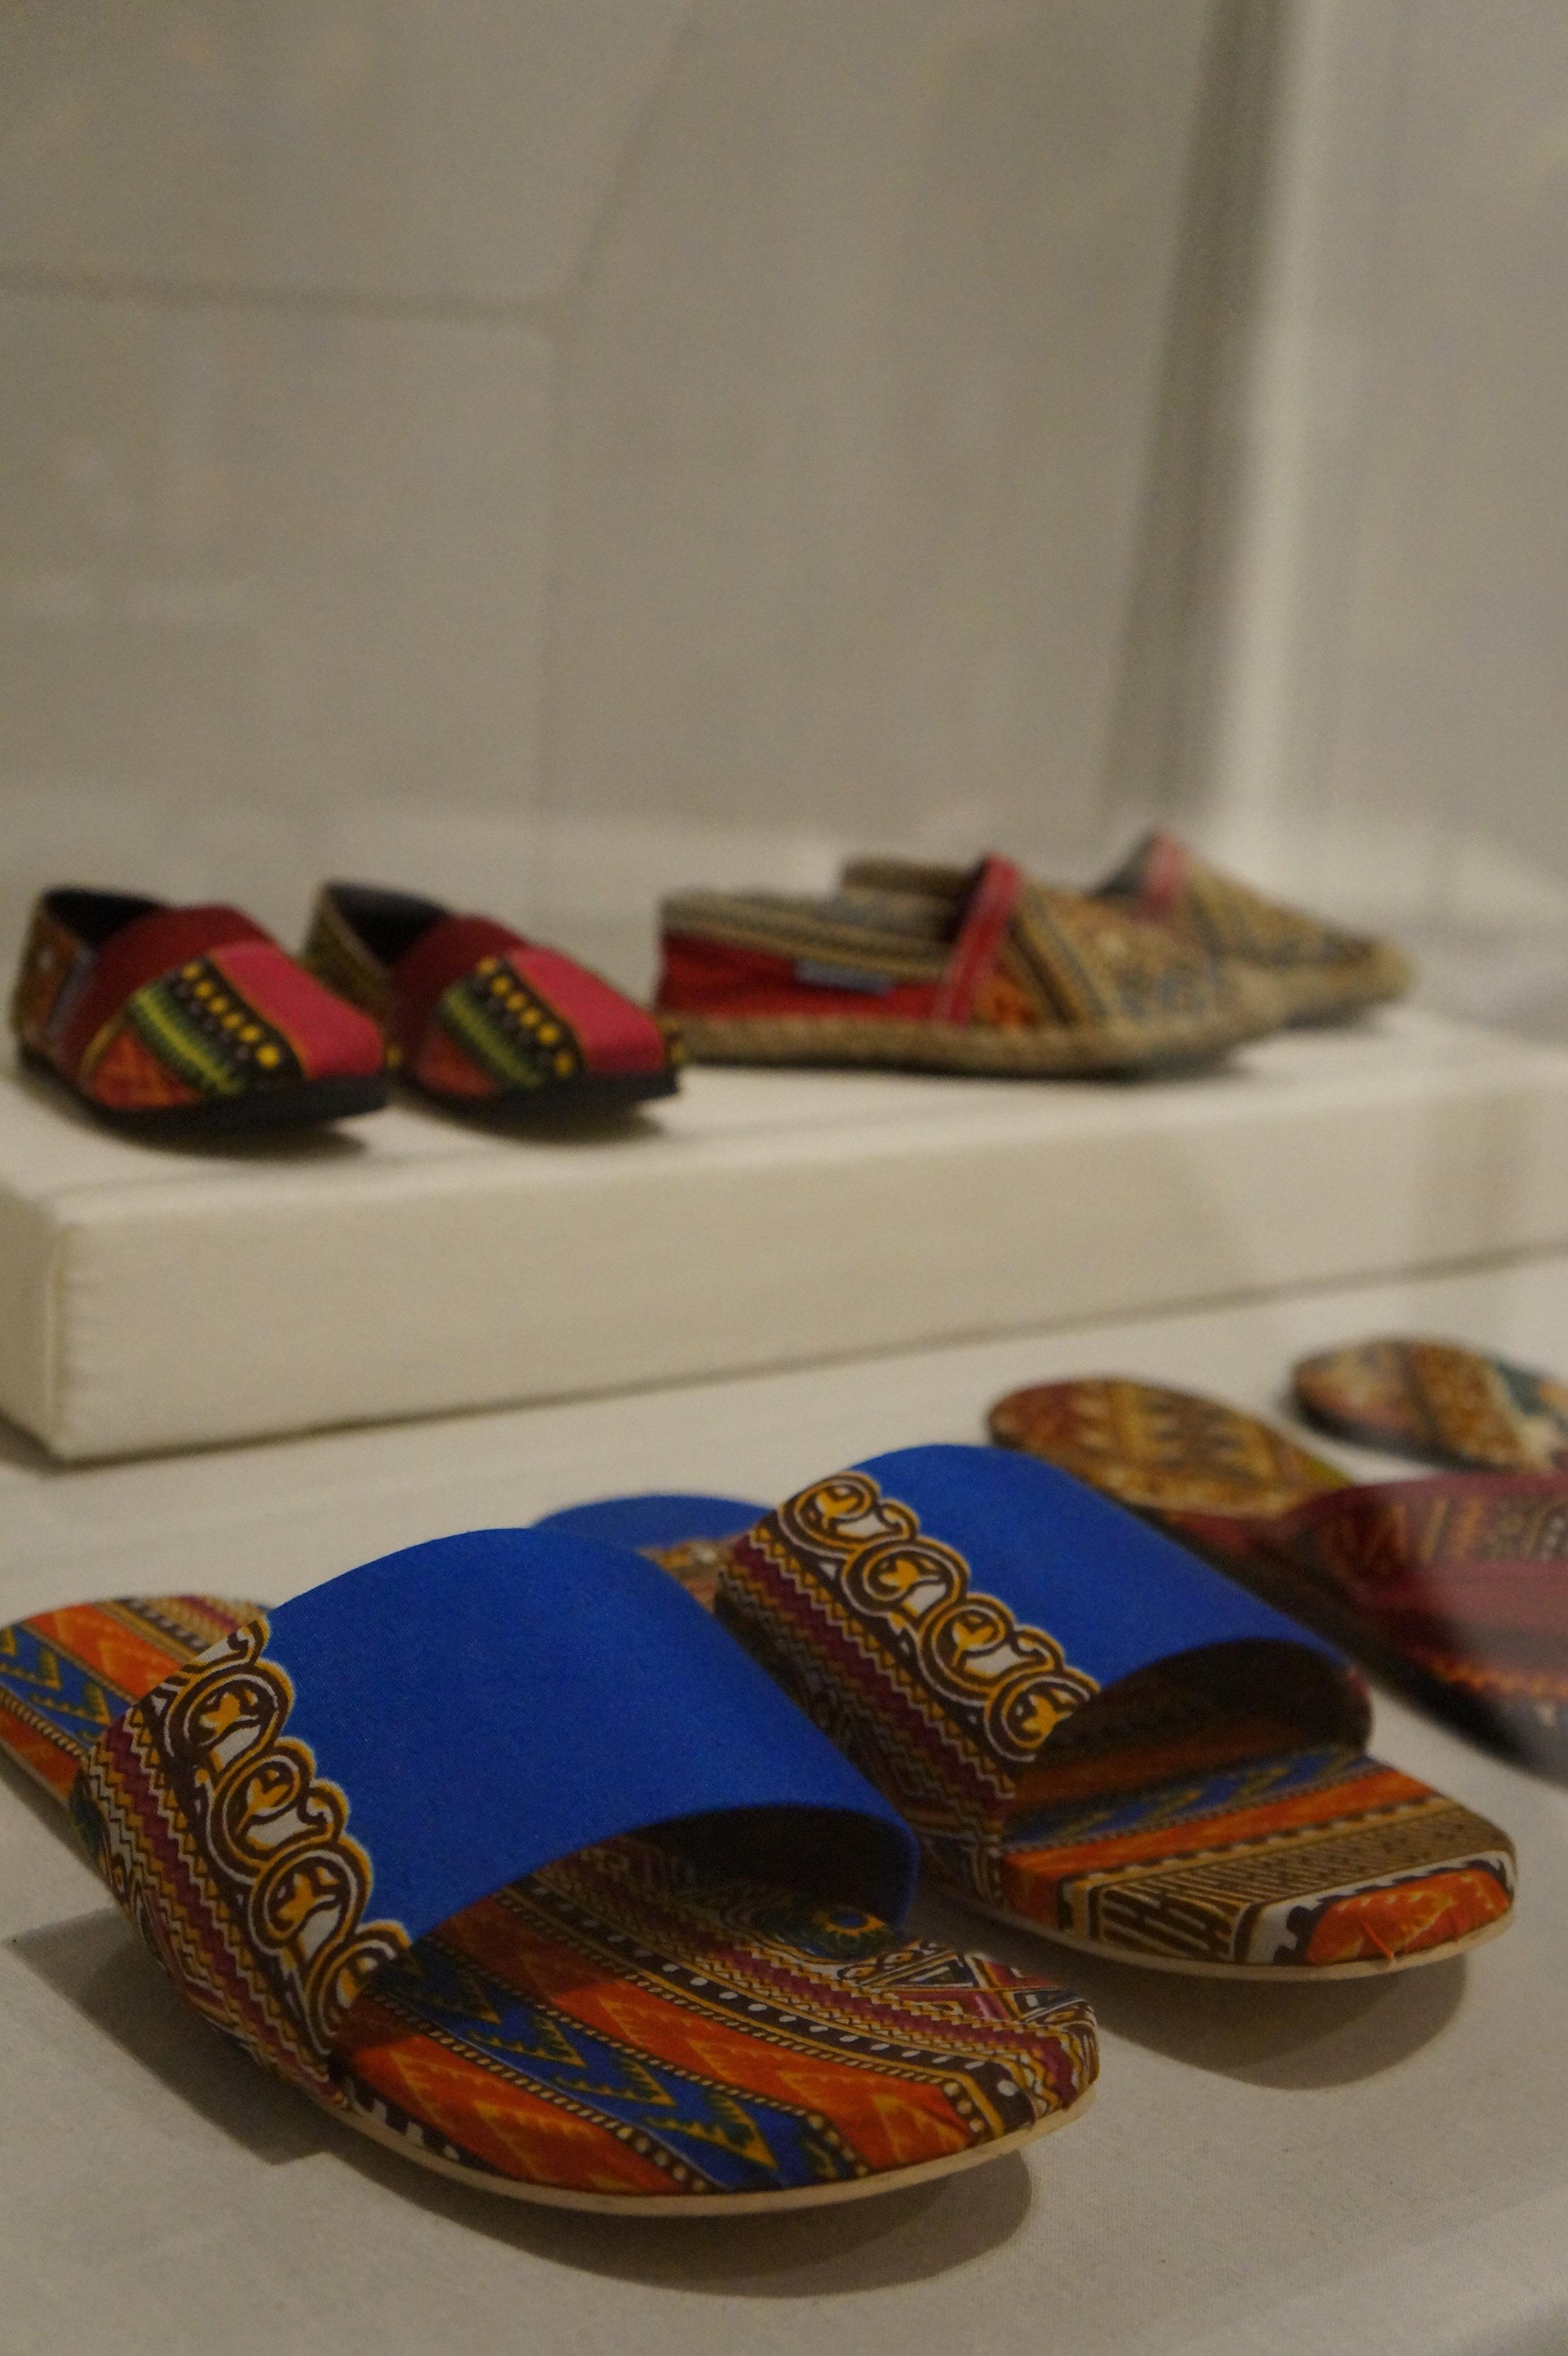 Andrea Fenise Memphis Fashion Blogger shares African Pritn Fashion Now exhibit